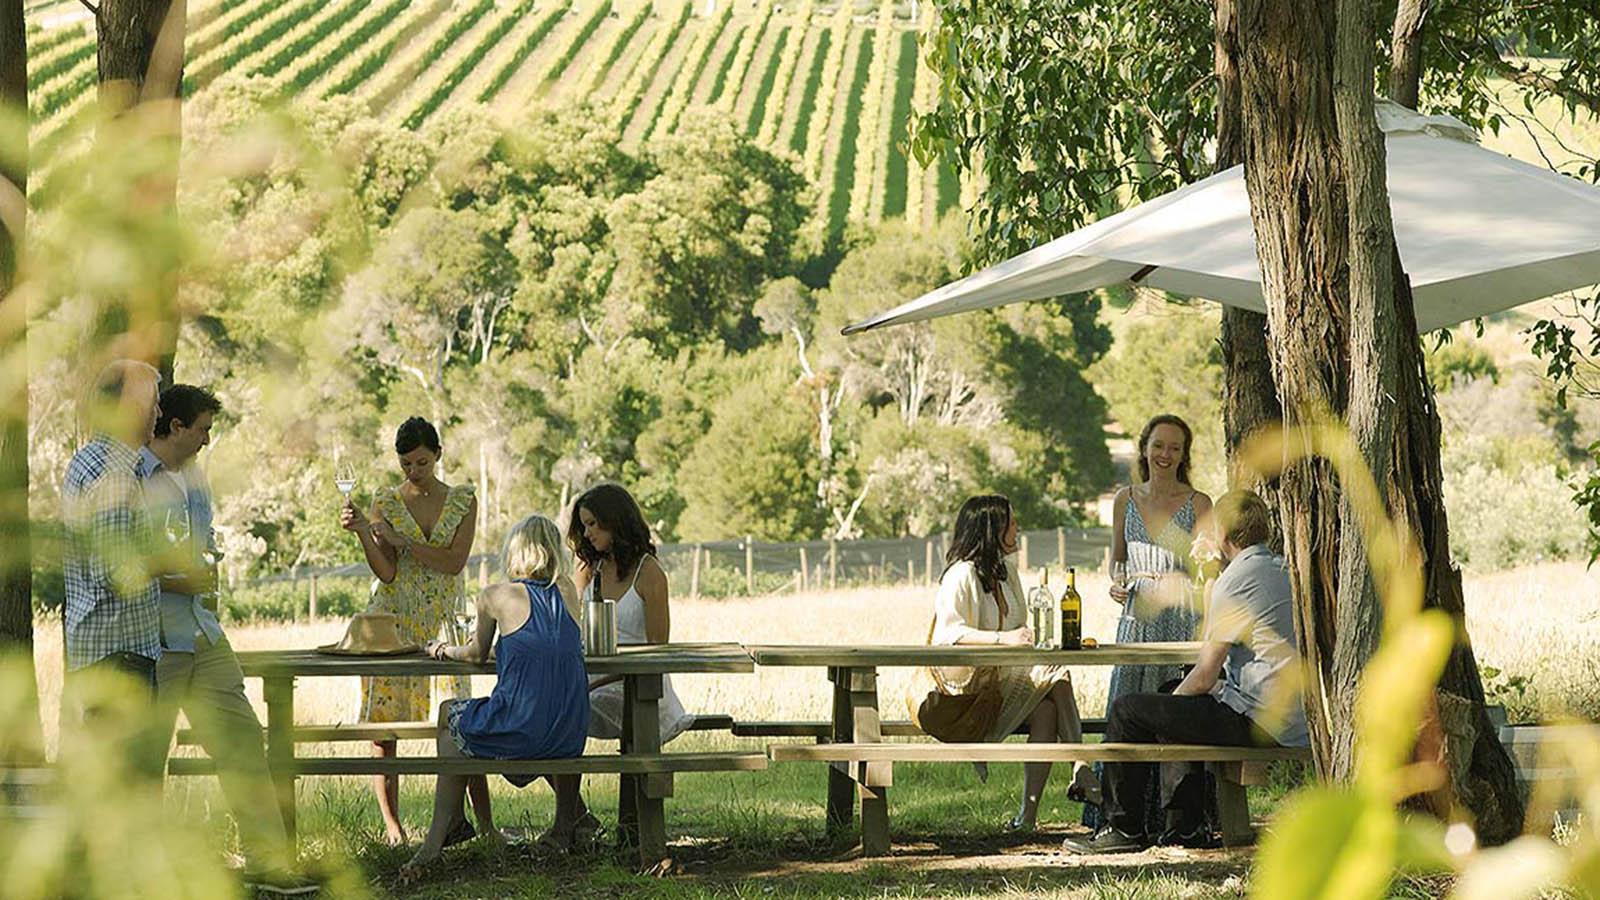 Montalton Vineyard and Olive Grove, Mornington Peninsula, Victoria, Australia